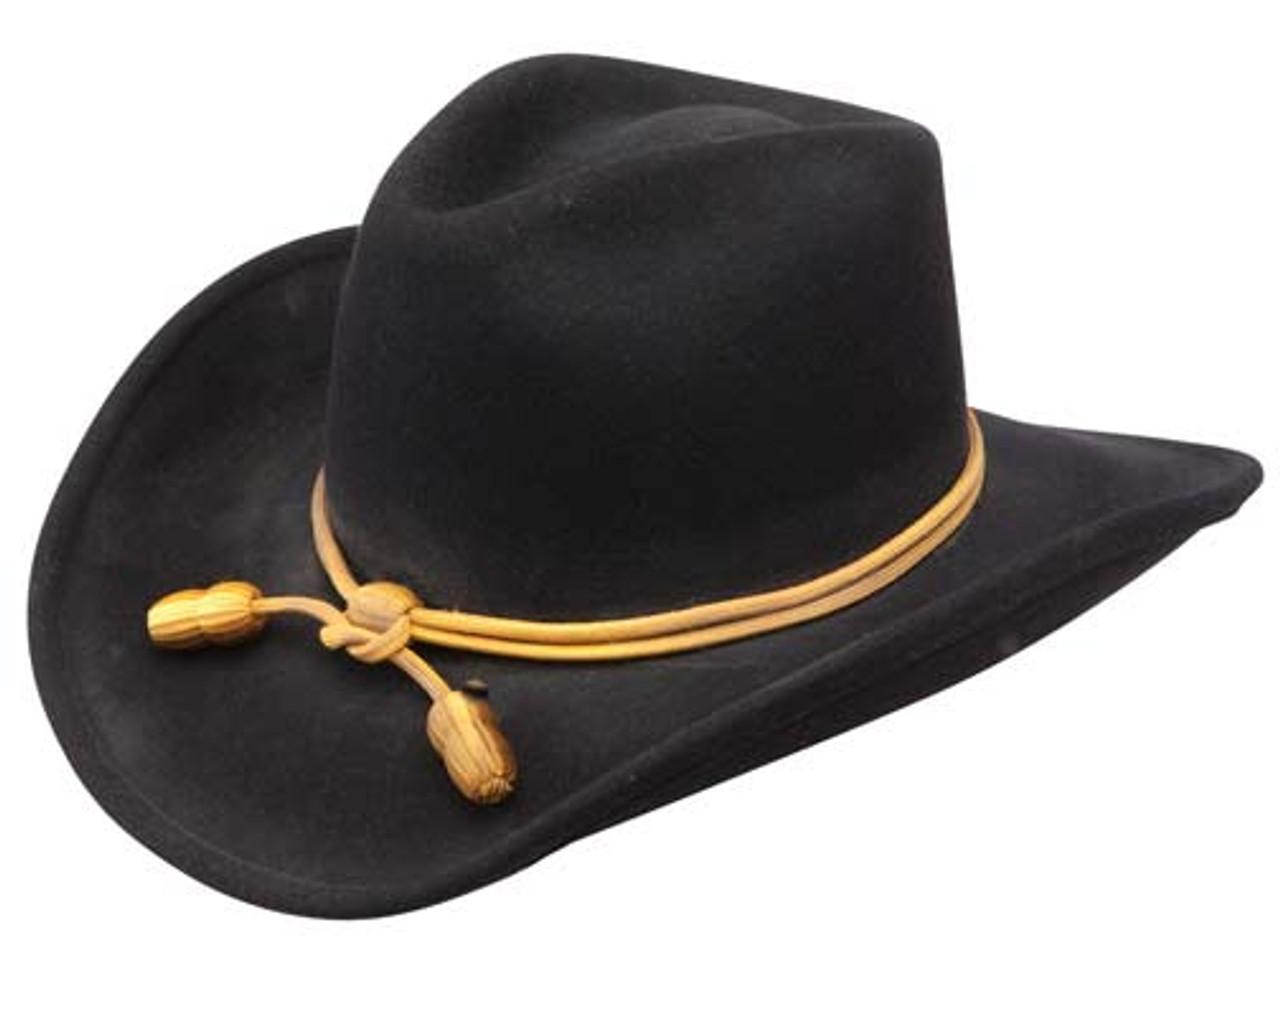 0b1a0d5442ef0 RESISTOL JOHN WAYNE THE FORT CRUSHABLE BLACK CAVALRY COWBOY HAT ...